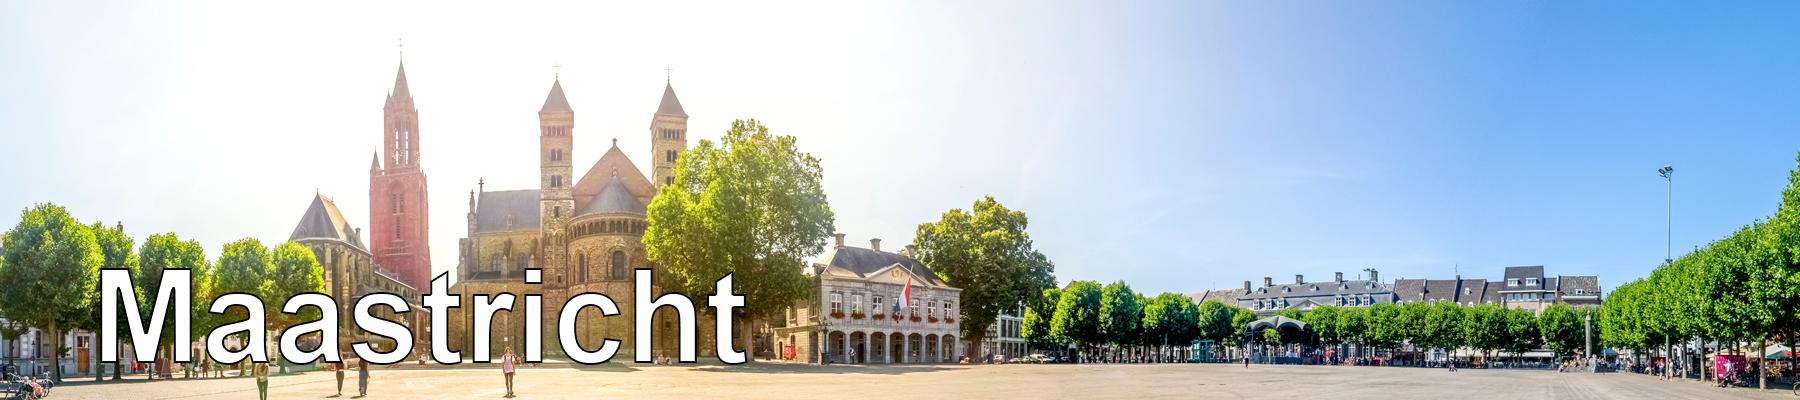 Maastricht: Bourgondisch stukje buitenland in Nederland